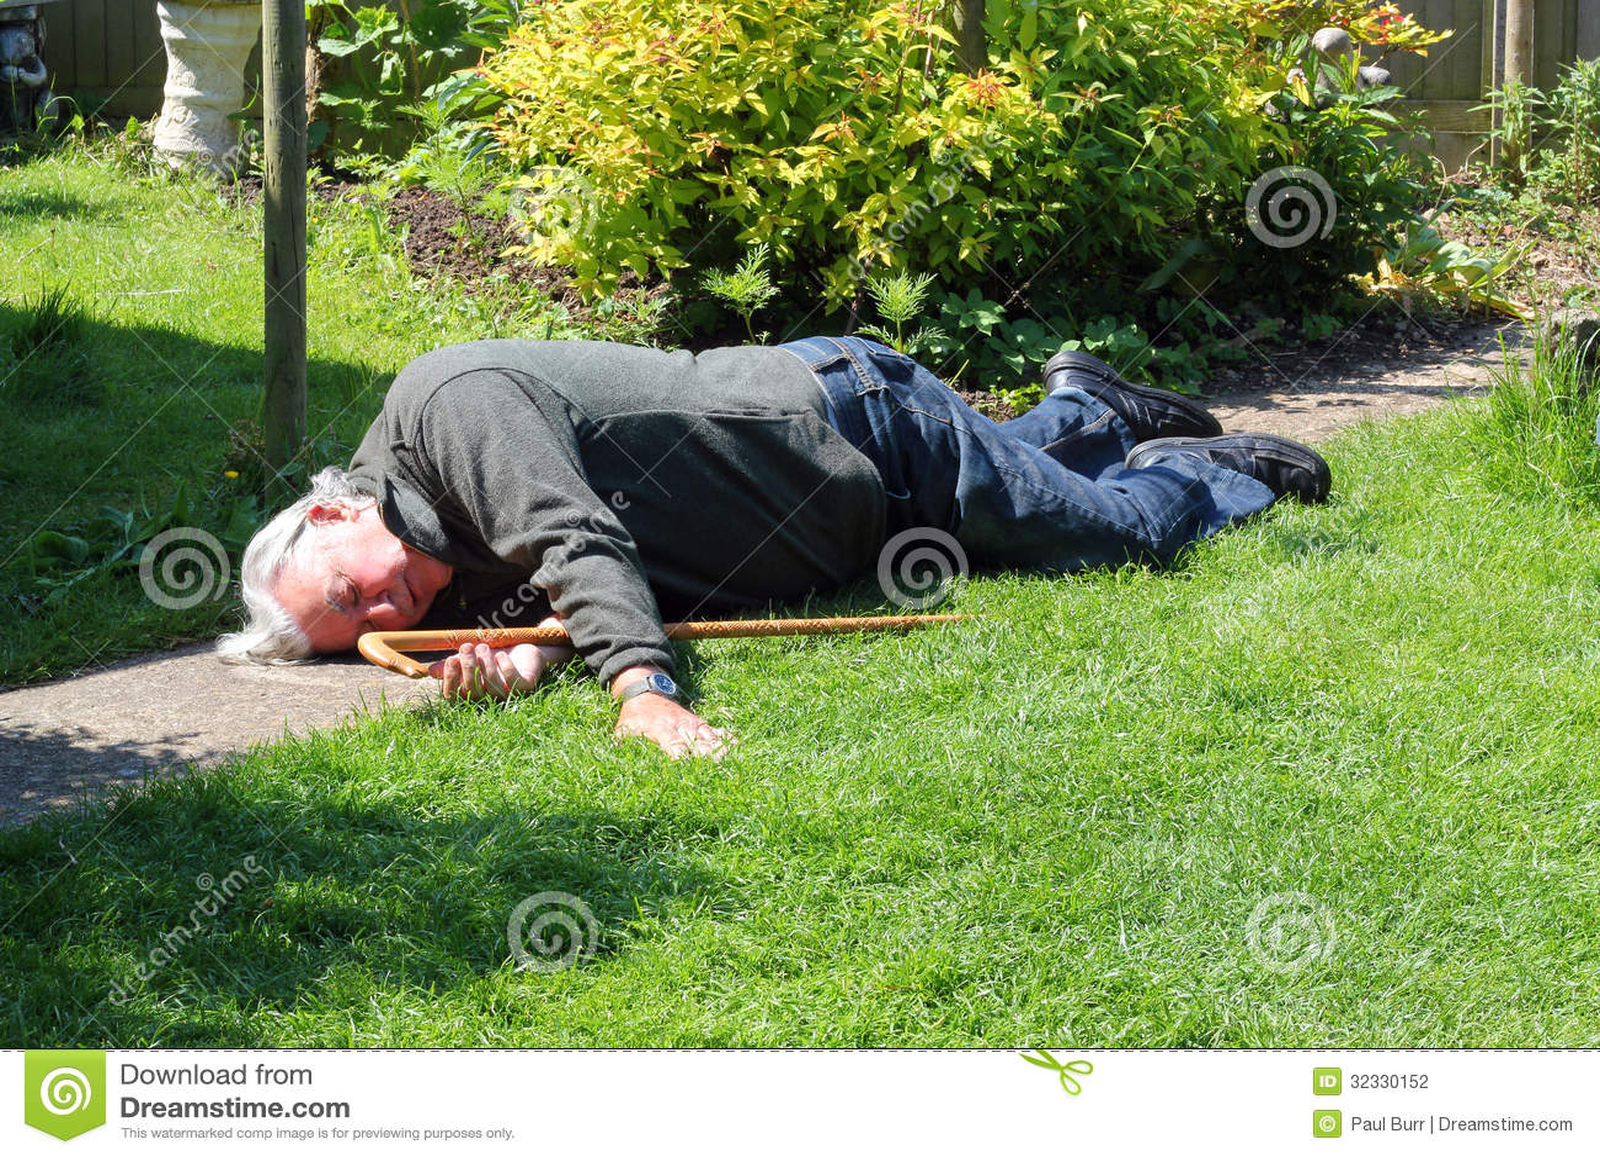 Dead or unconscious elderly man lying down.